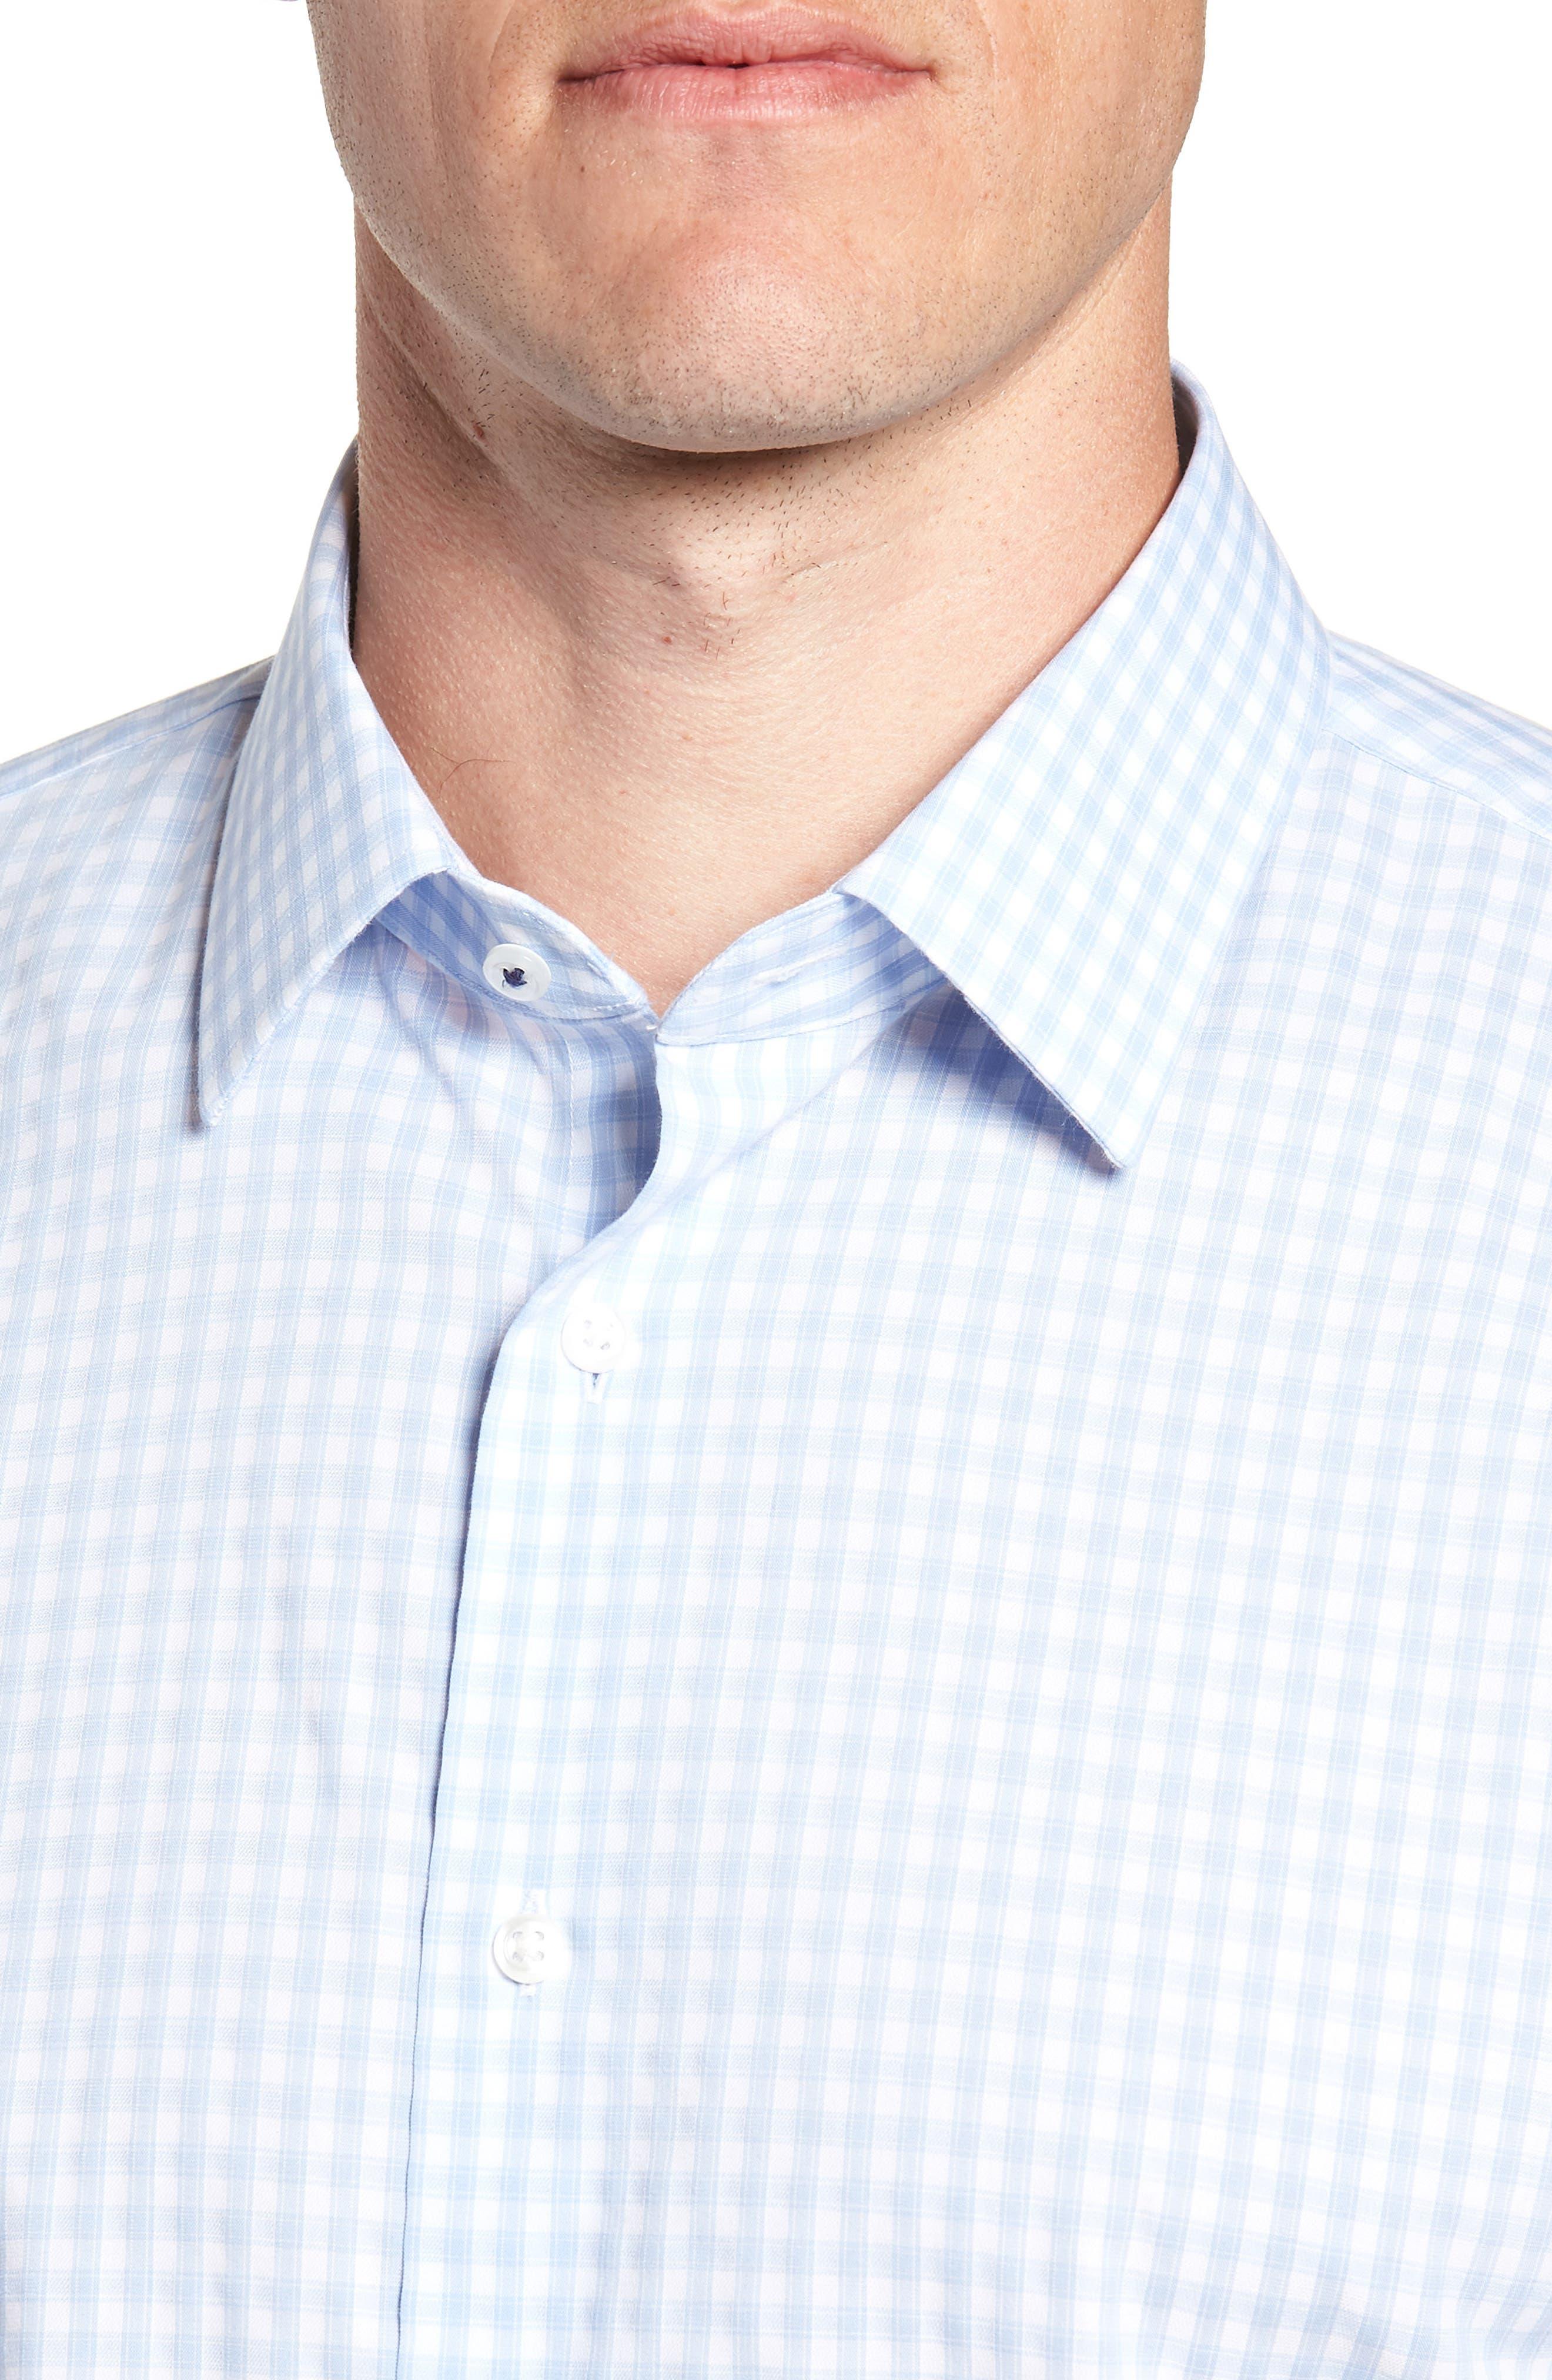 Tech-Smart Trim Fit Stretch Check Dress Shirt,                             Alternate thumbnail 2, color,                             BLUE BRUNNERA